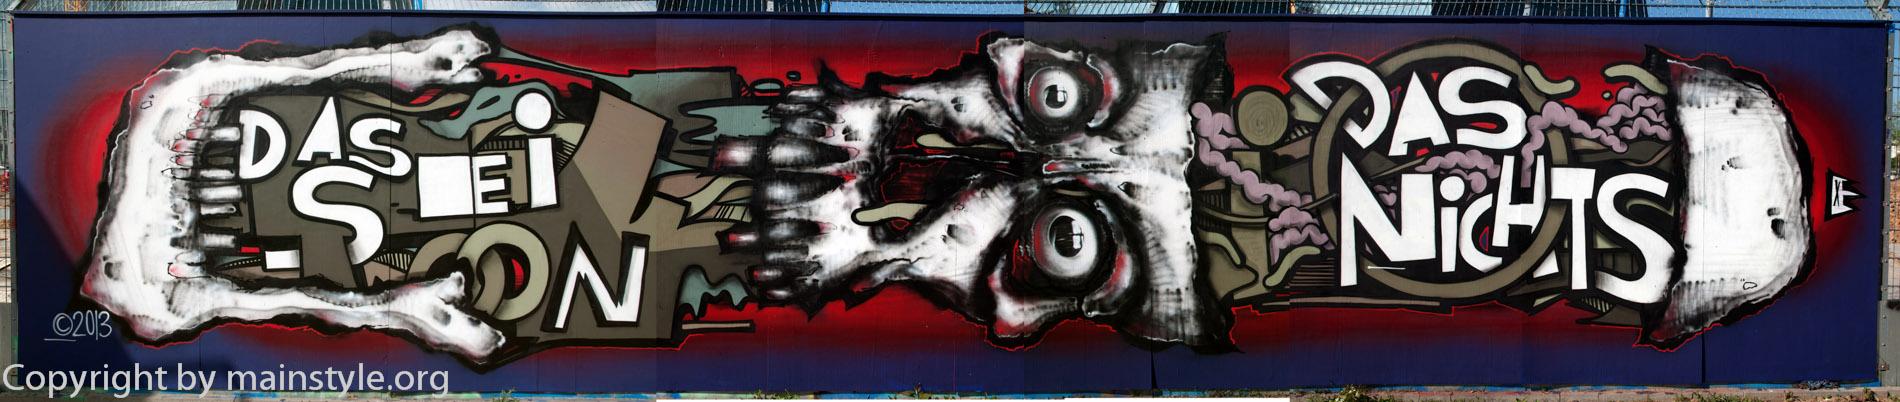 Frankfurt_Nacht_der_Museen_Graffiti_EZB_2013_Part3_full--2